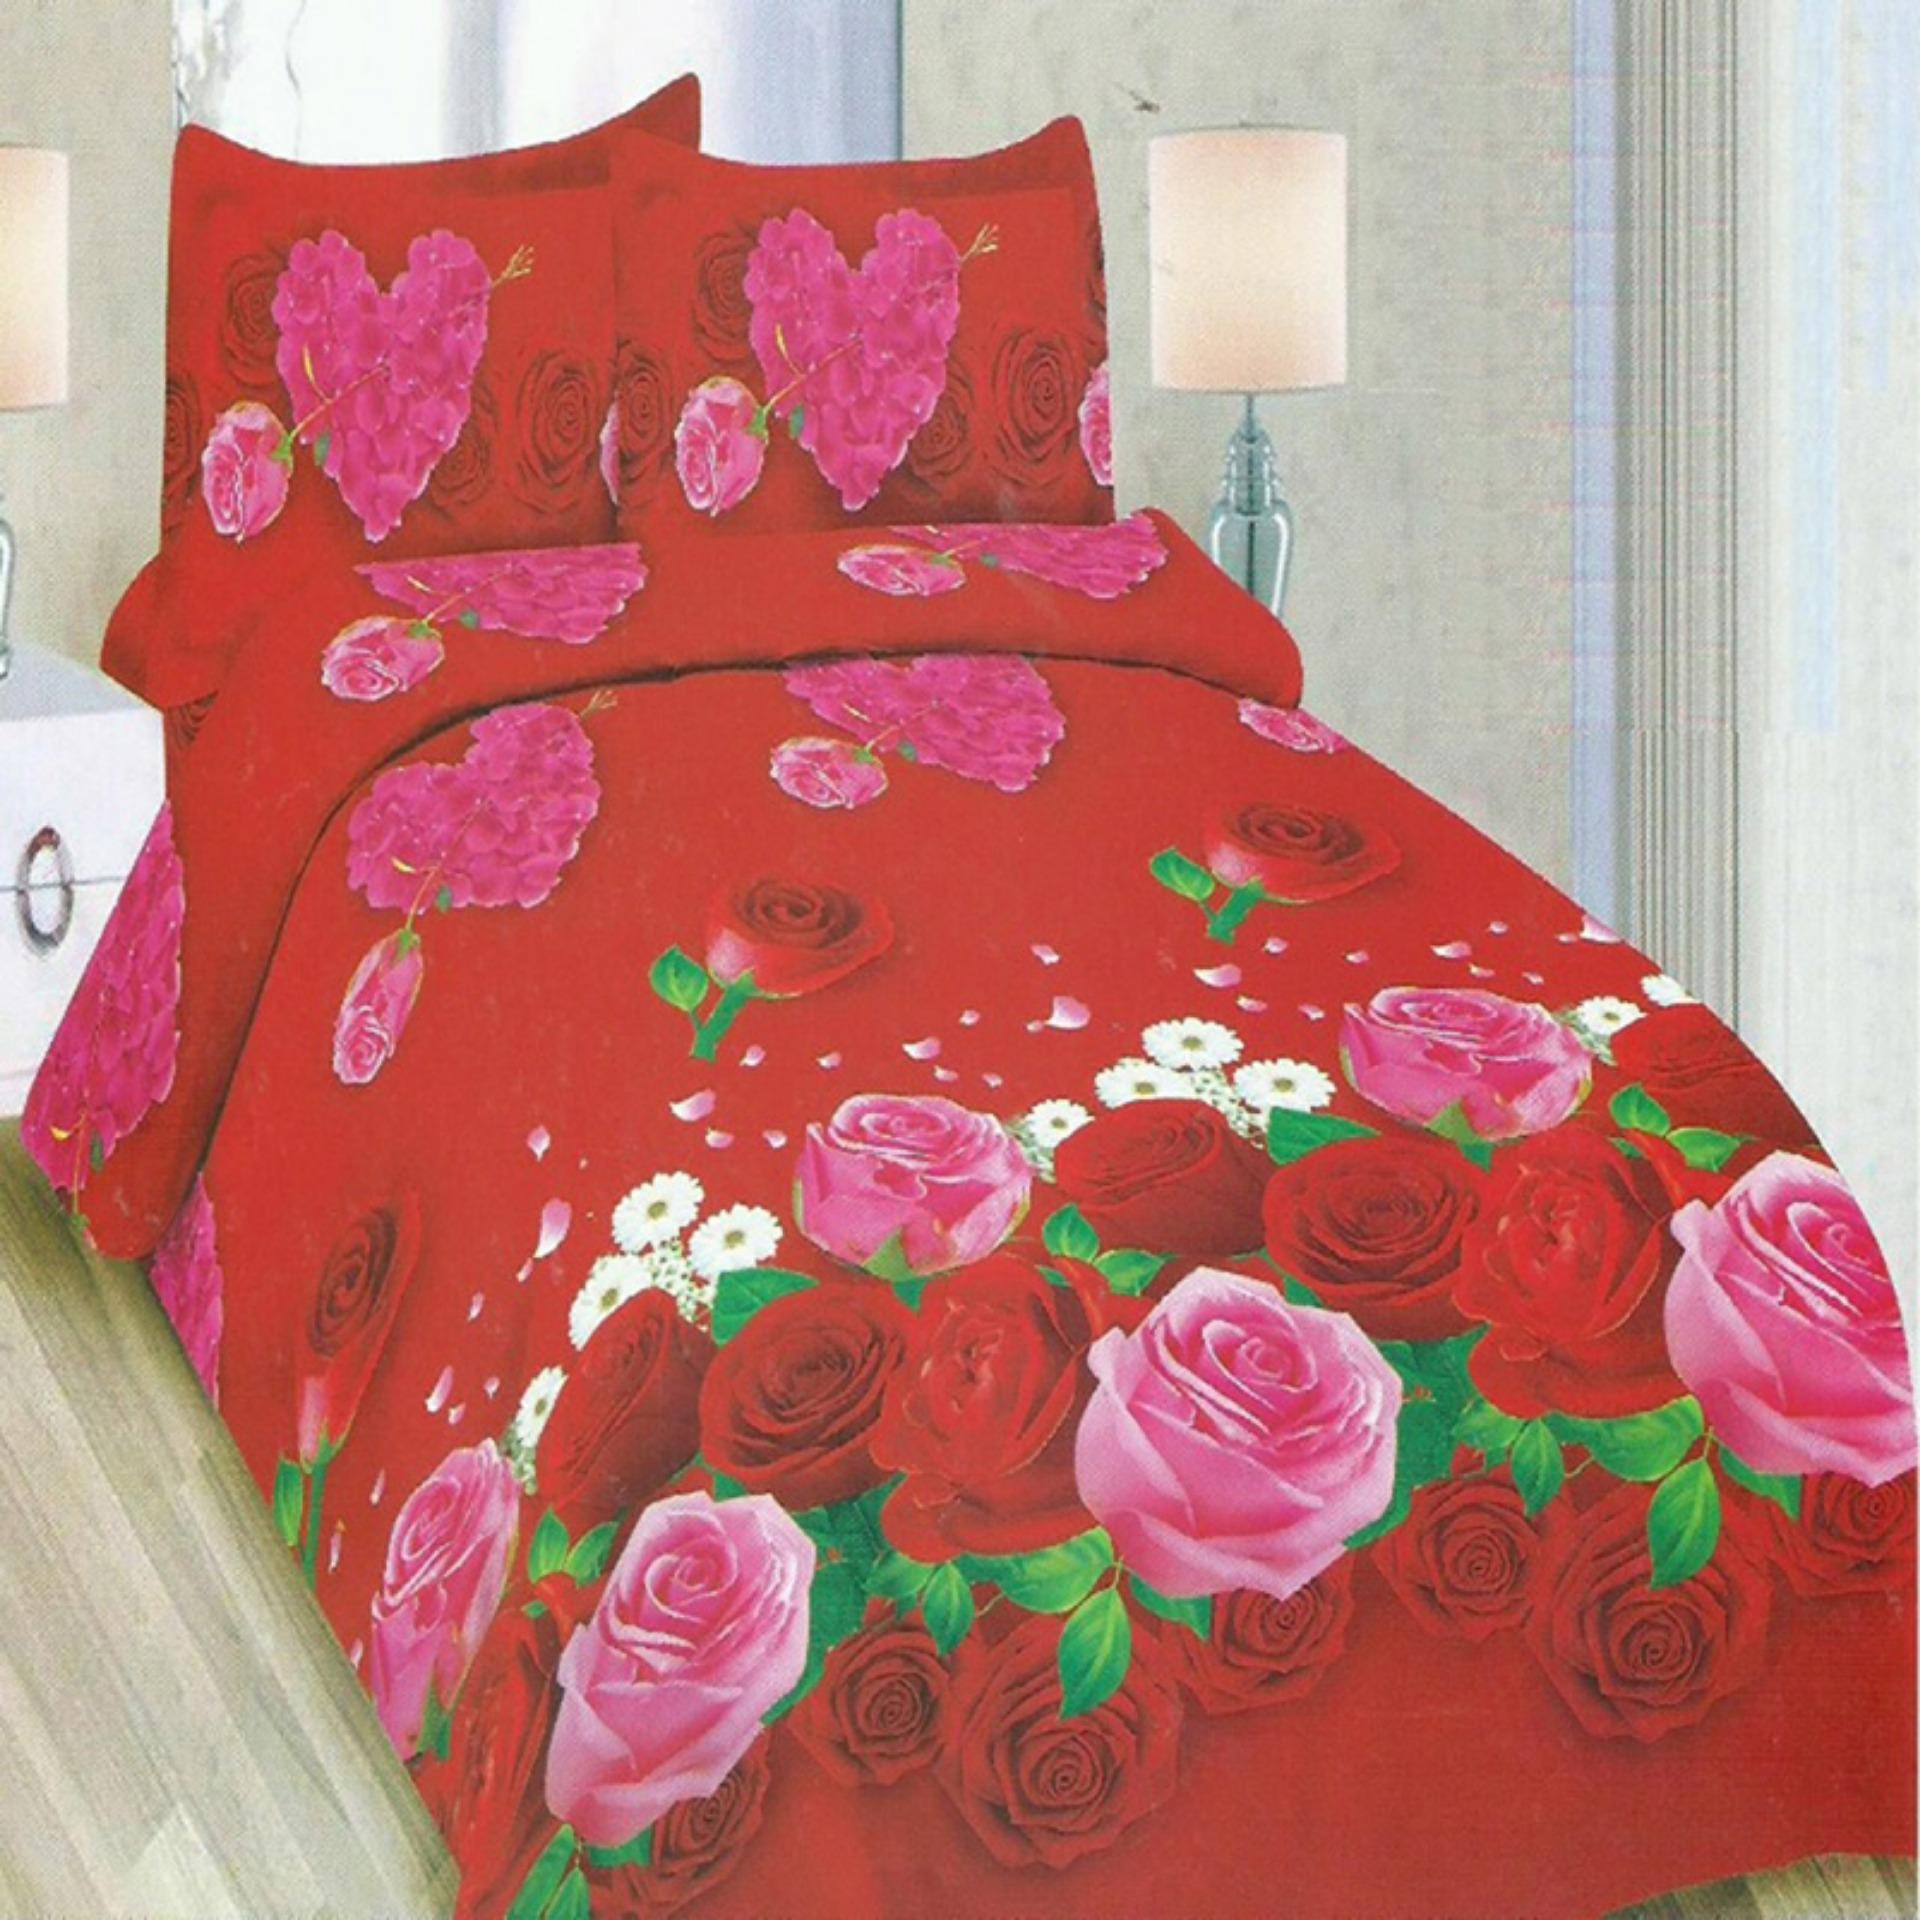 Bonita Sprei King Bantal 4 Motif Lovely Rose - 180x200 cm